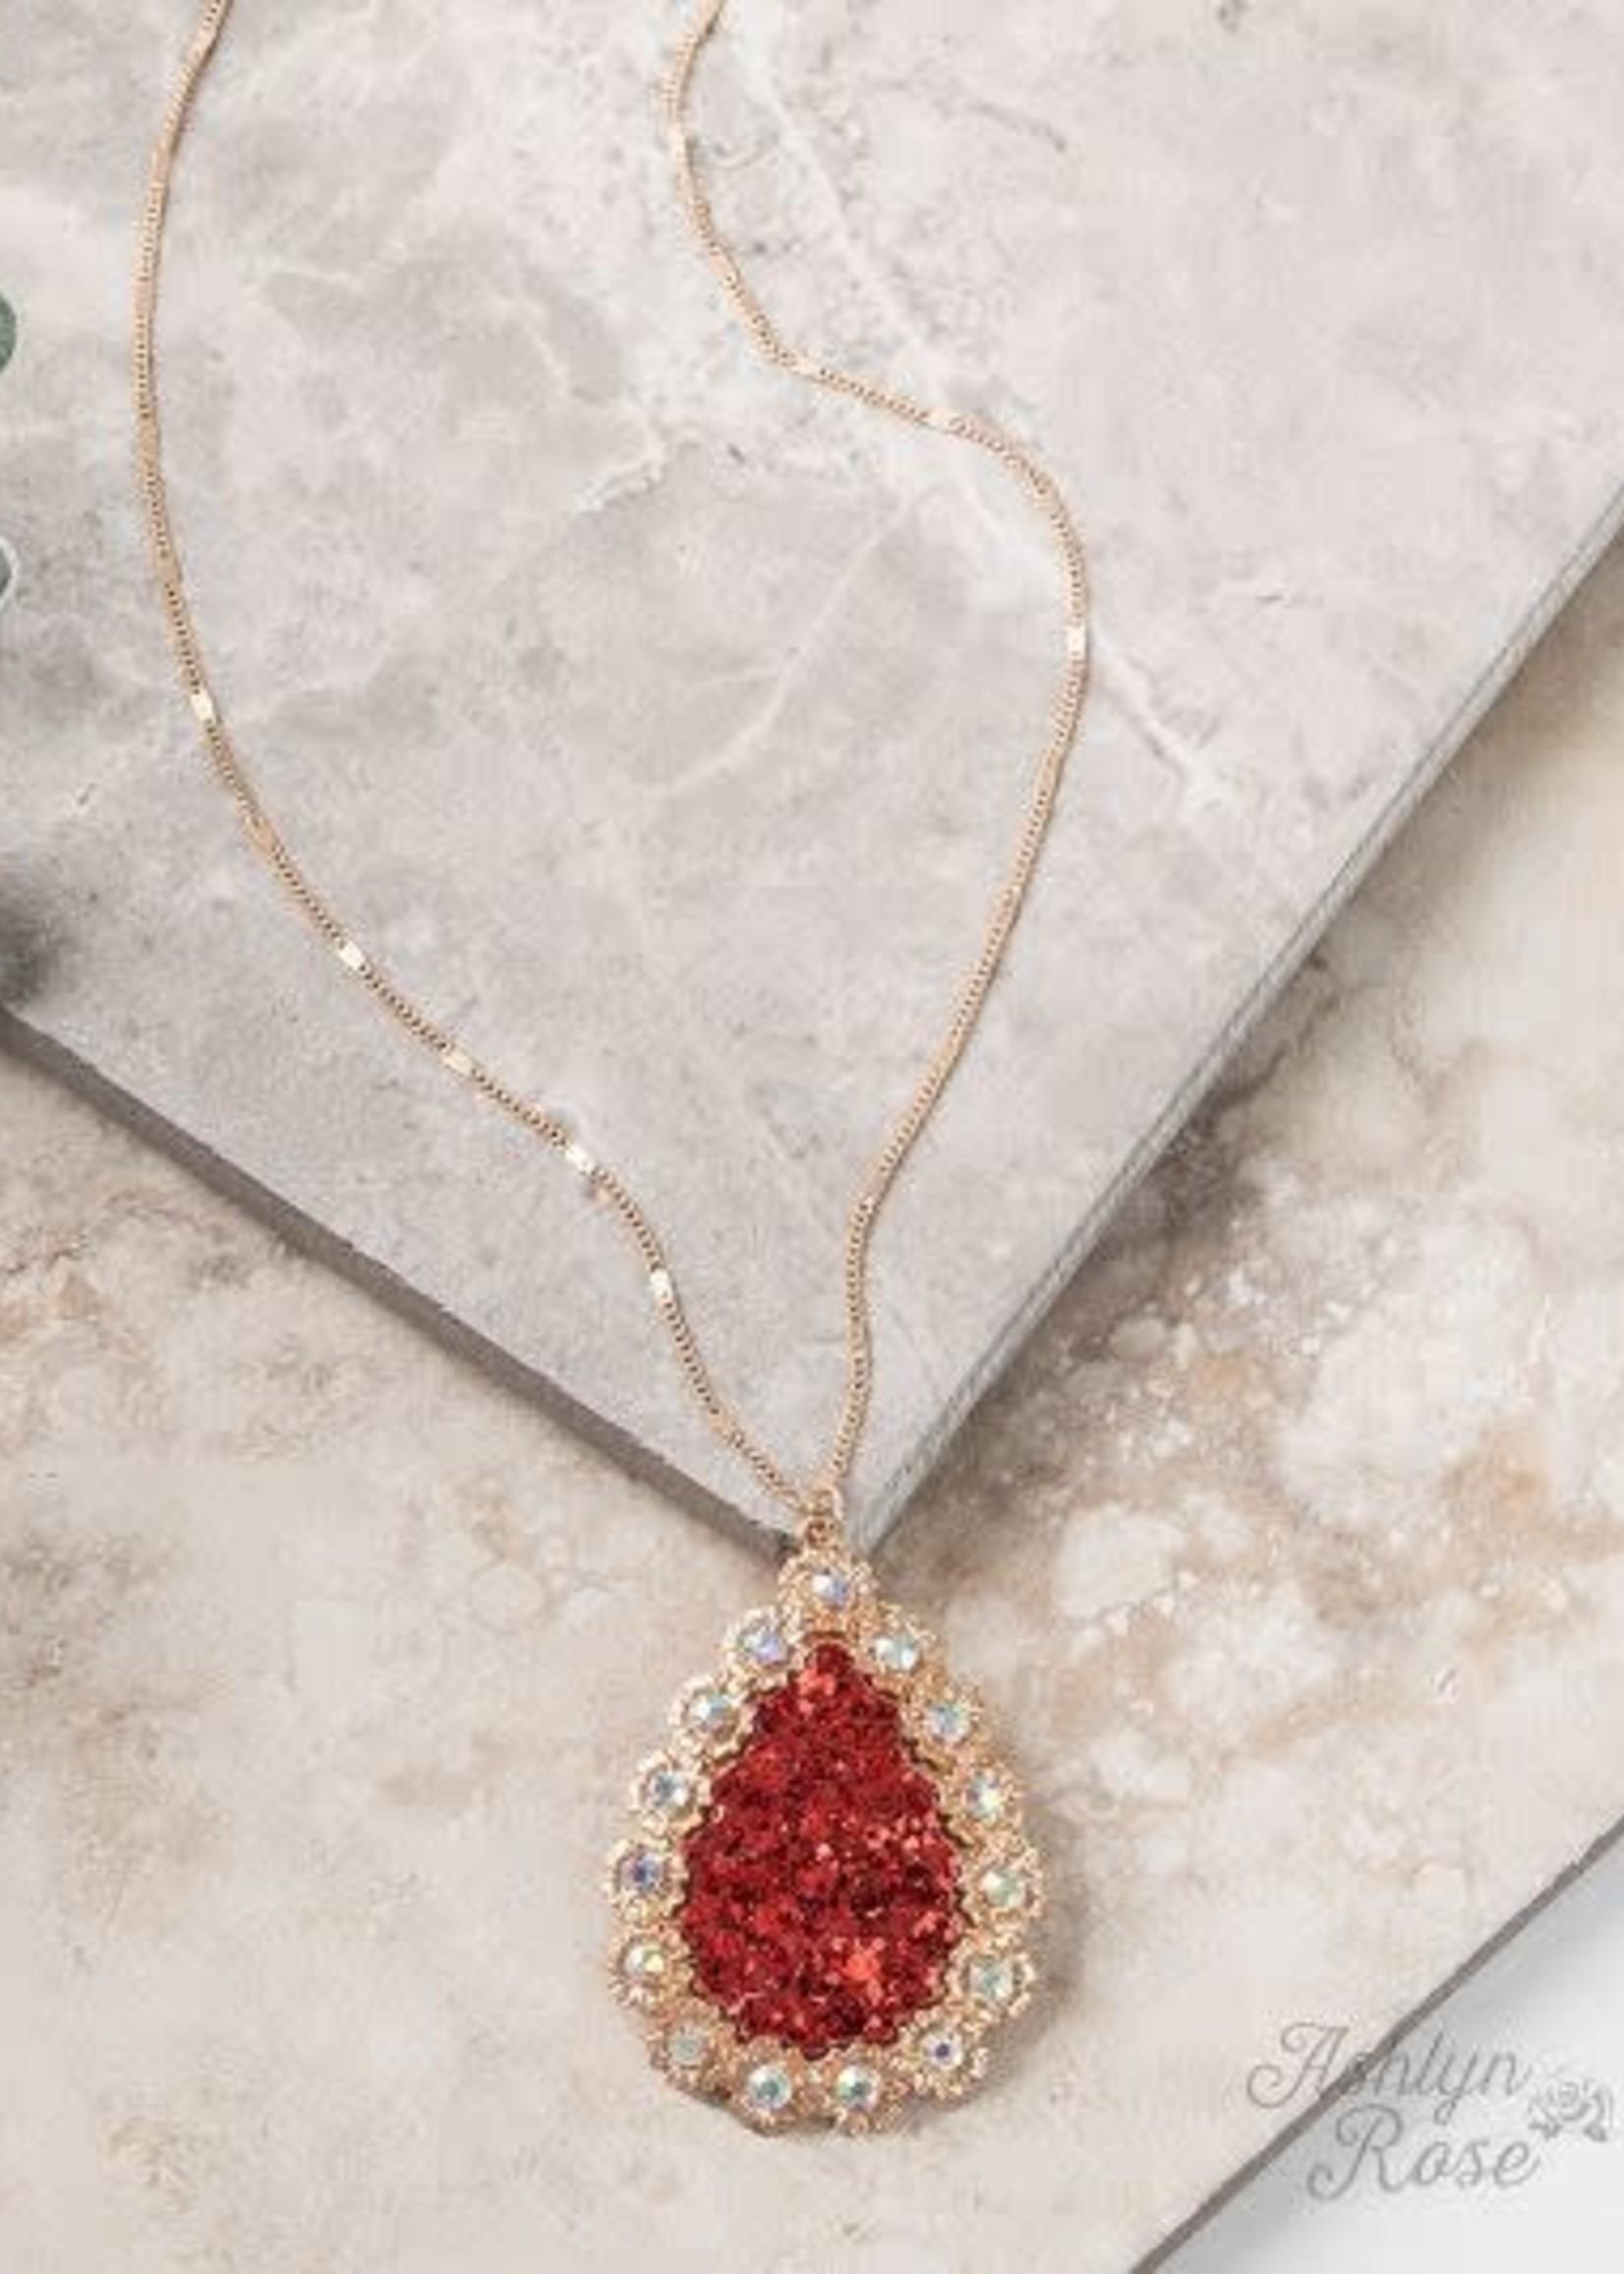 Dainty Gold Chain w/ AB Flower Teardrop Pendant Necklace